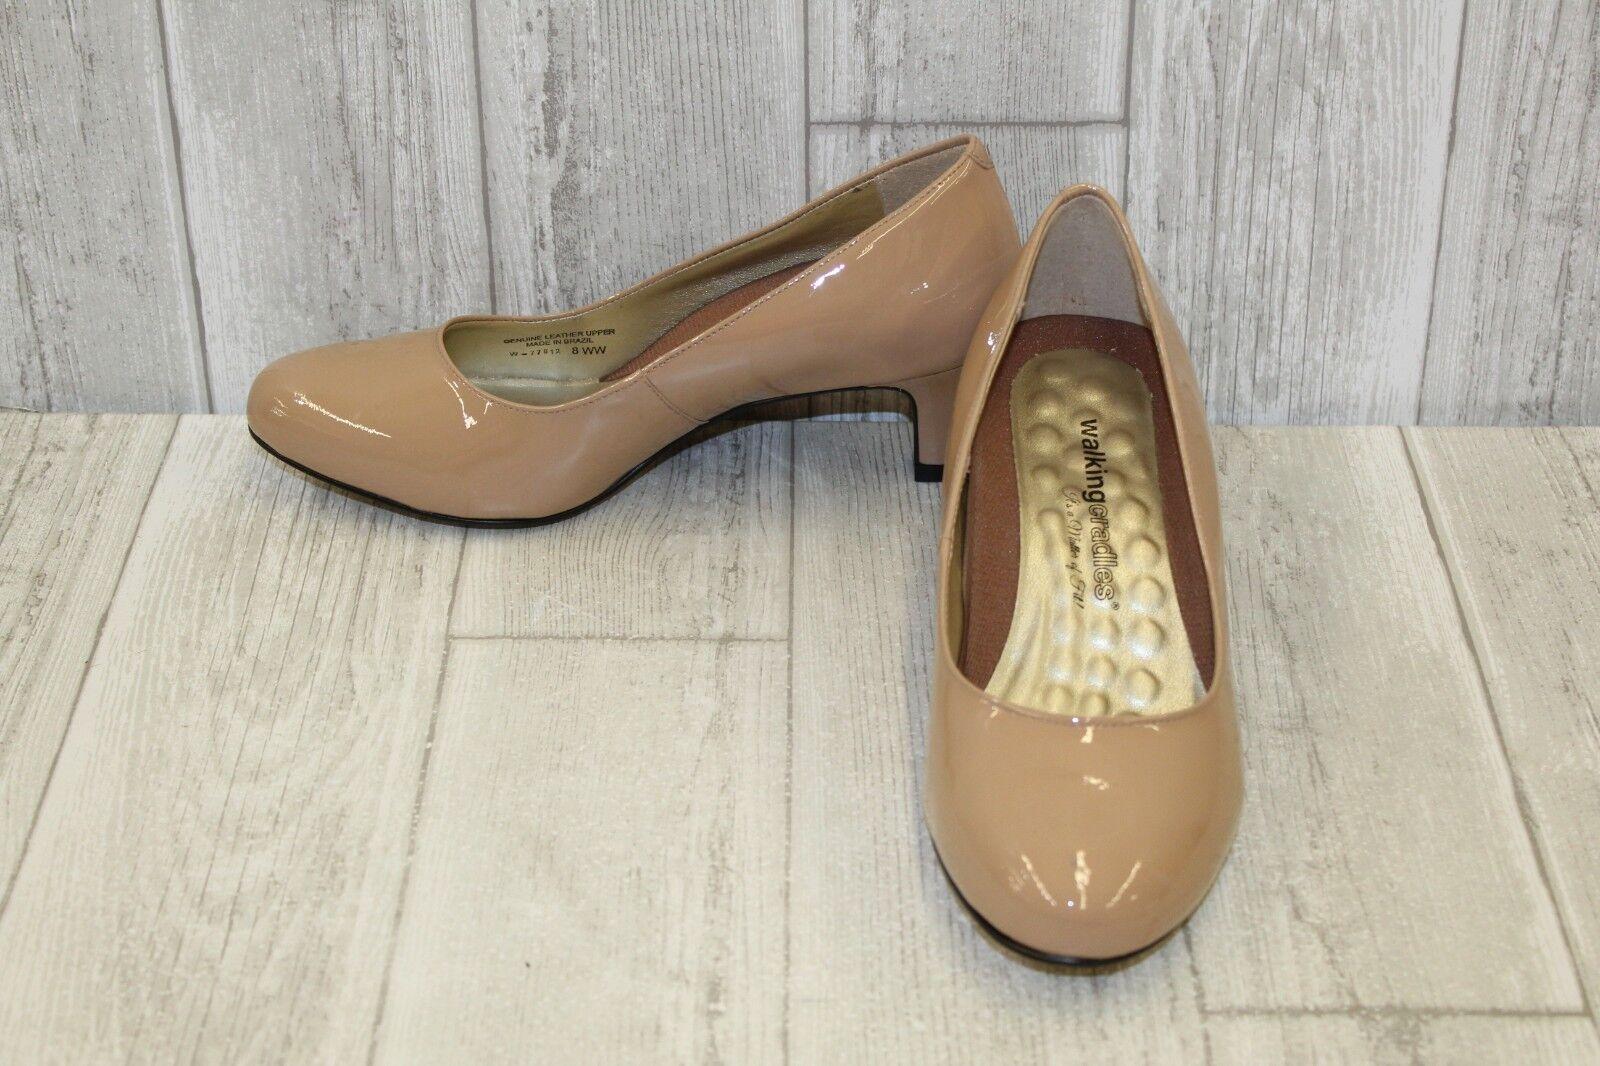 Walking Cradles Joy Heel - Women's Size 8WW Beige